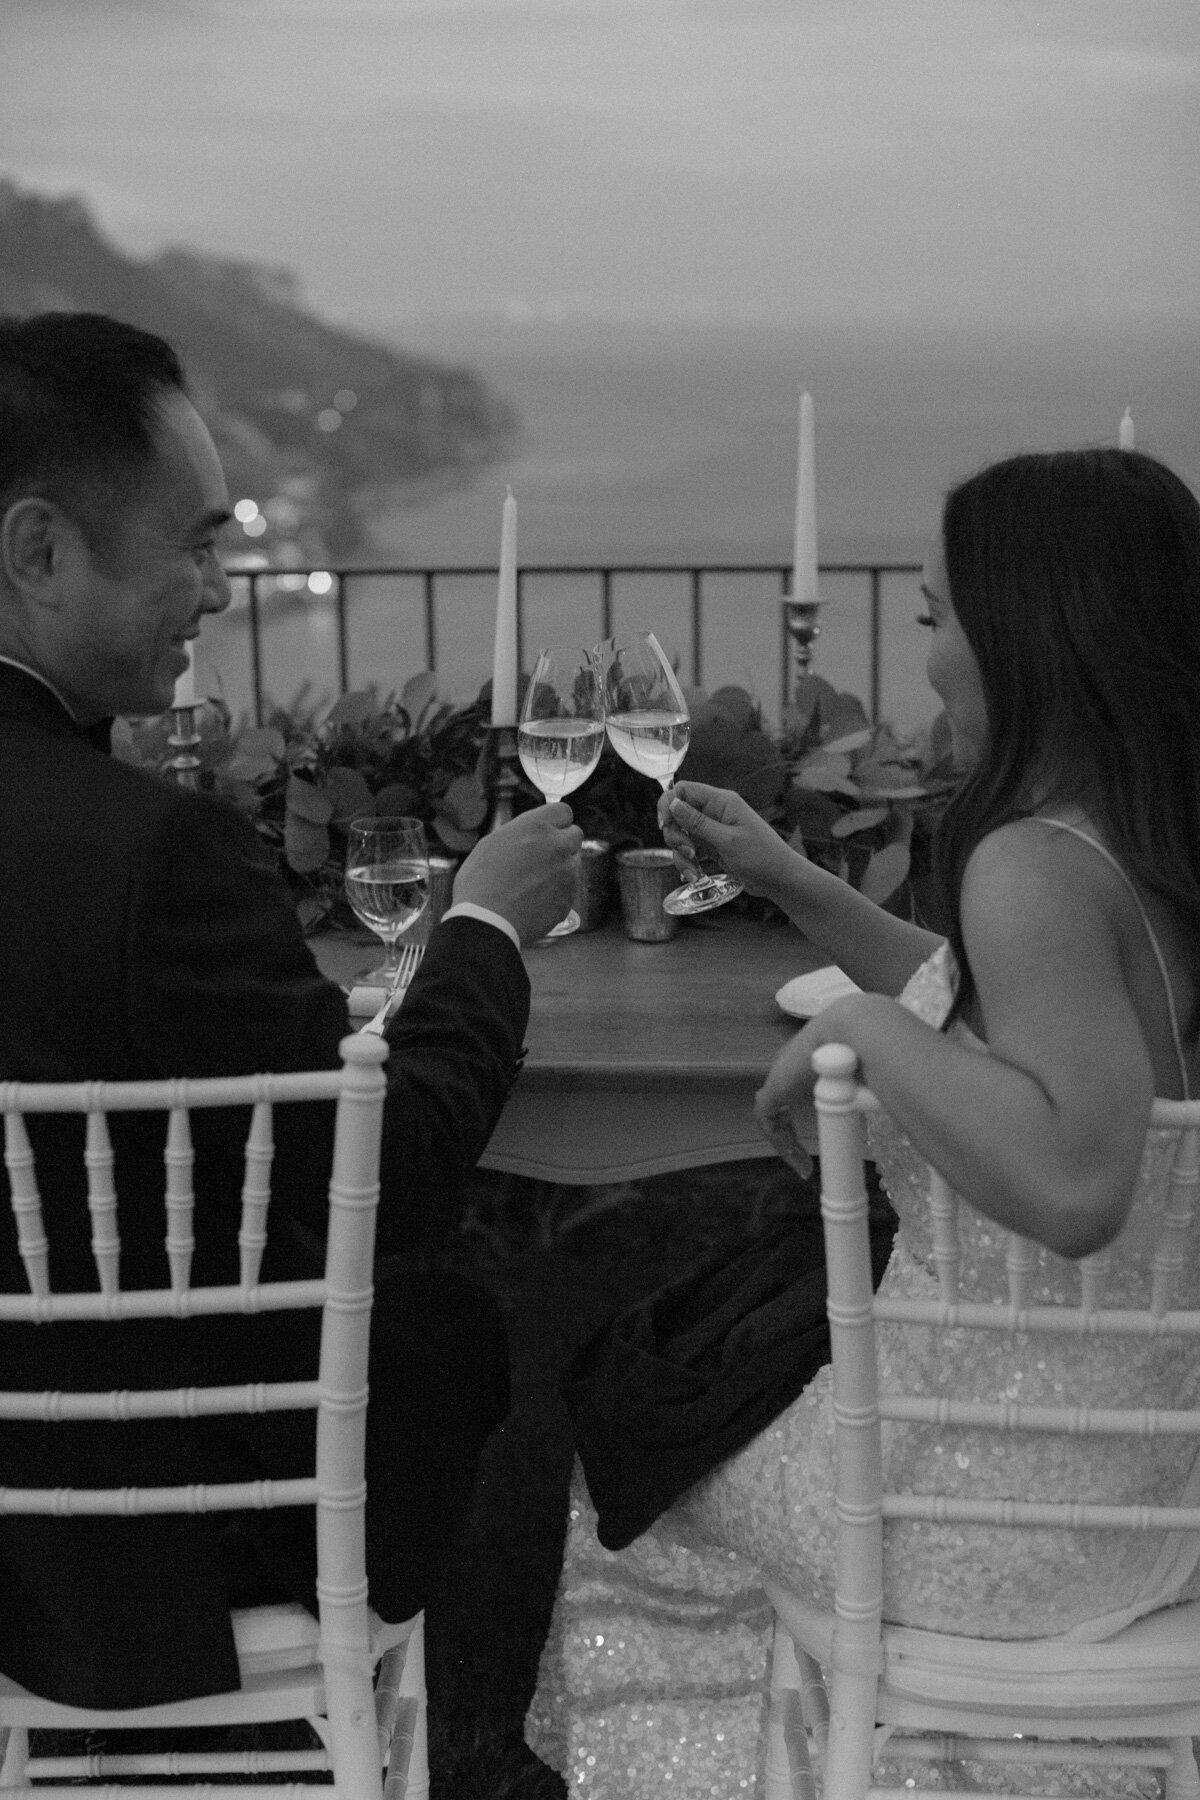 Belmond-Hotel-Caruso-ravello-elopement-Katie-Grant-destination-wedding (48 of 50).jpg